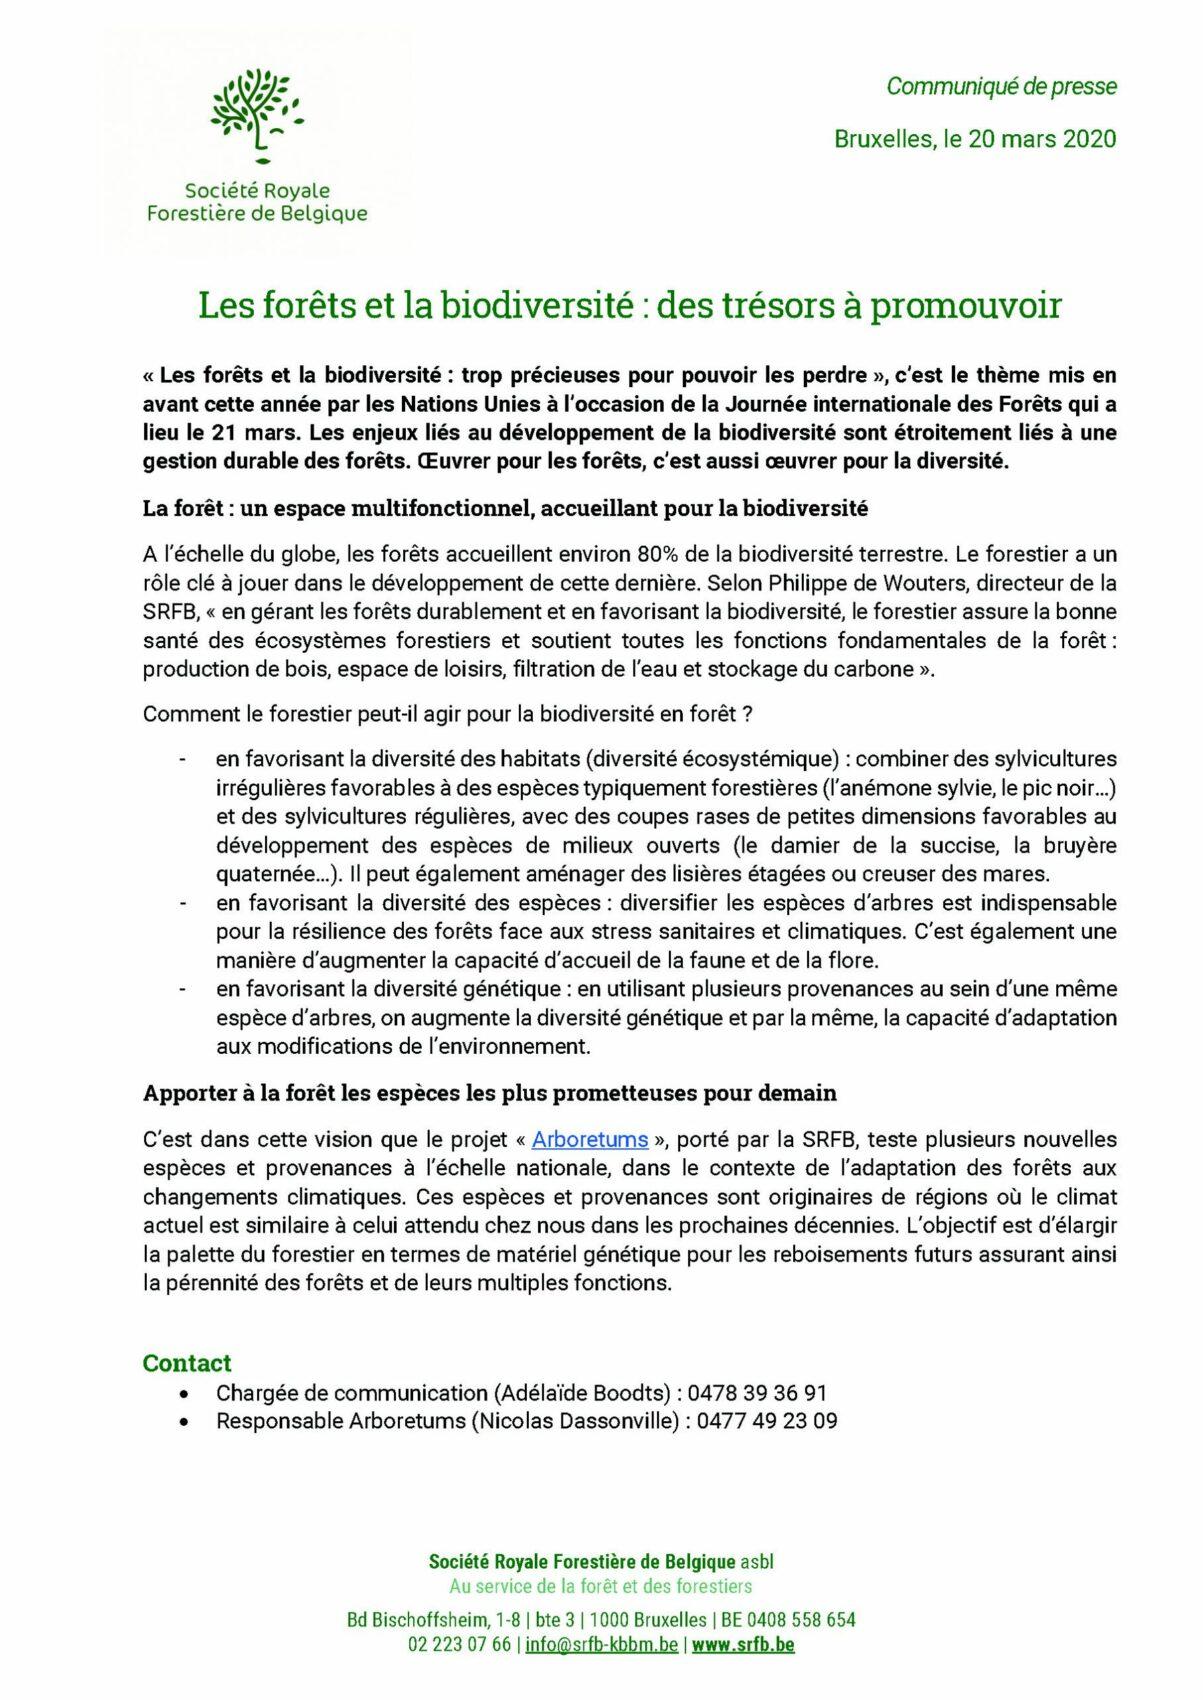 communique_de_presse_SRFB_2020